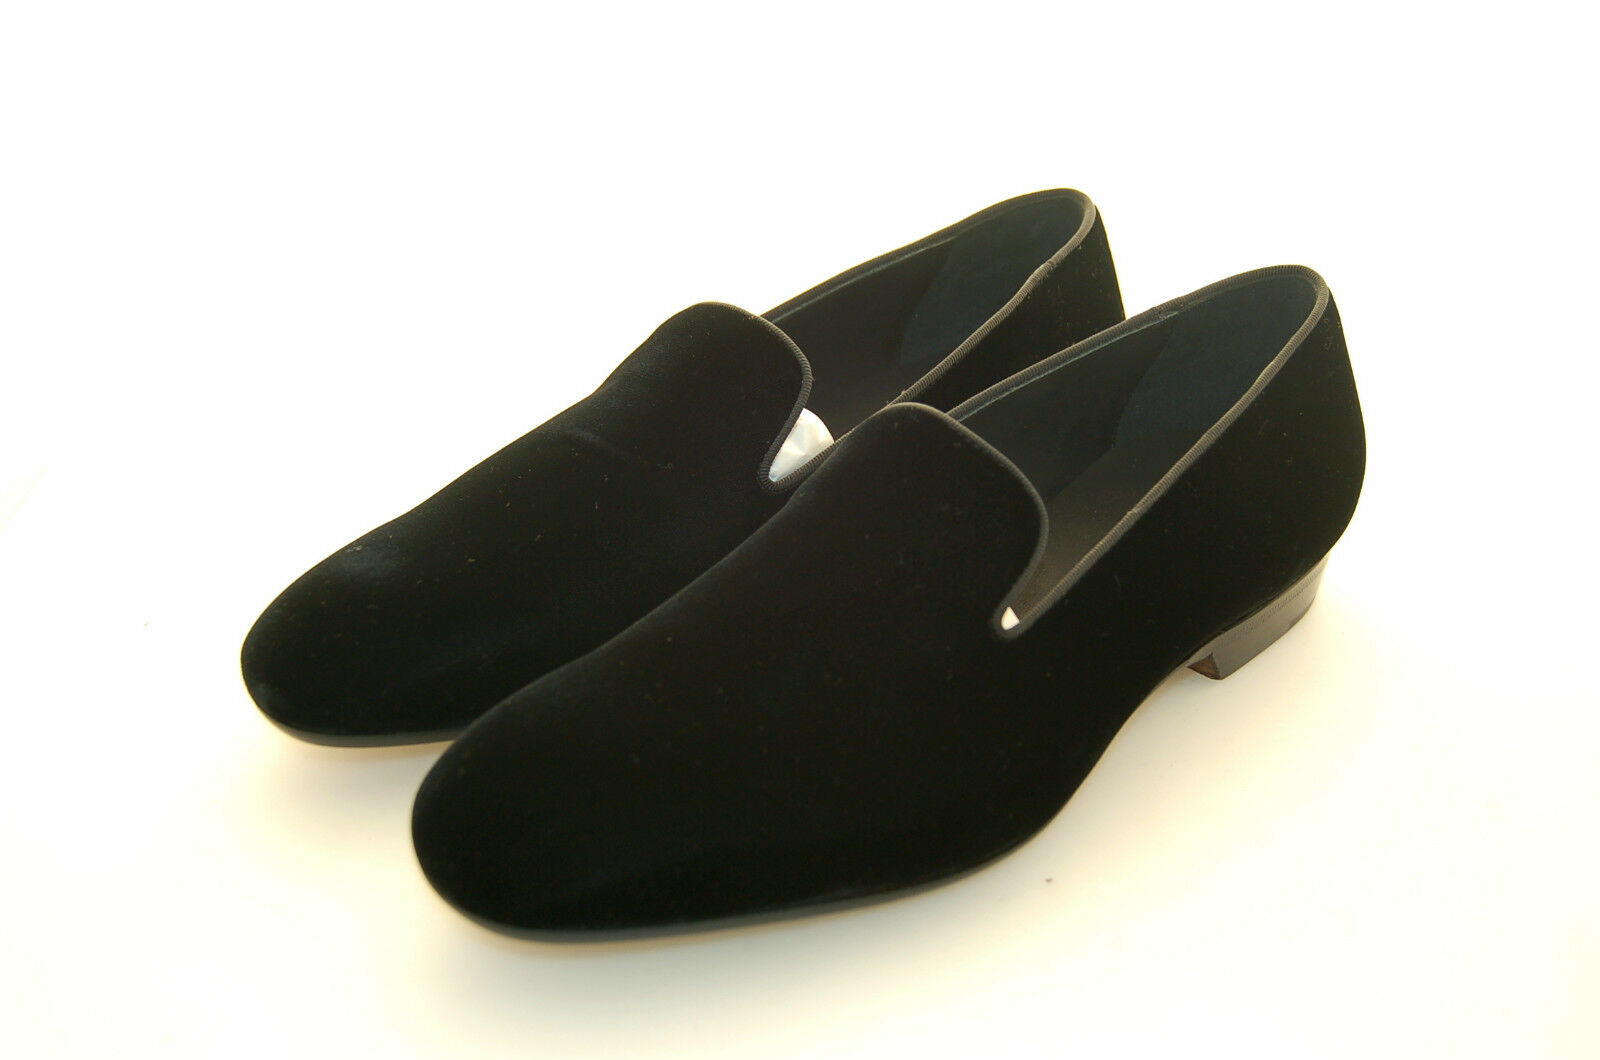 MAN - SLIPPER SLIPPER SLIPPER - PANTOFOLA - schwarz VELVET - VELLUTO schwarz - LEATHER SOLE 8b9354